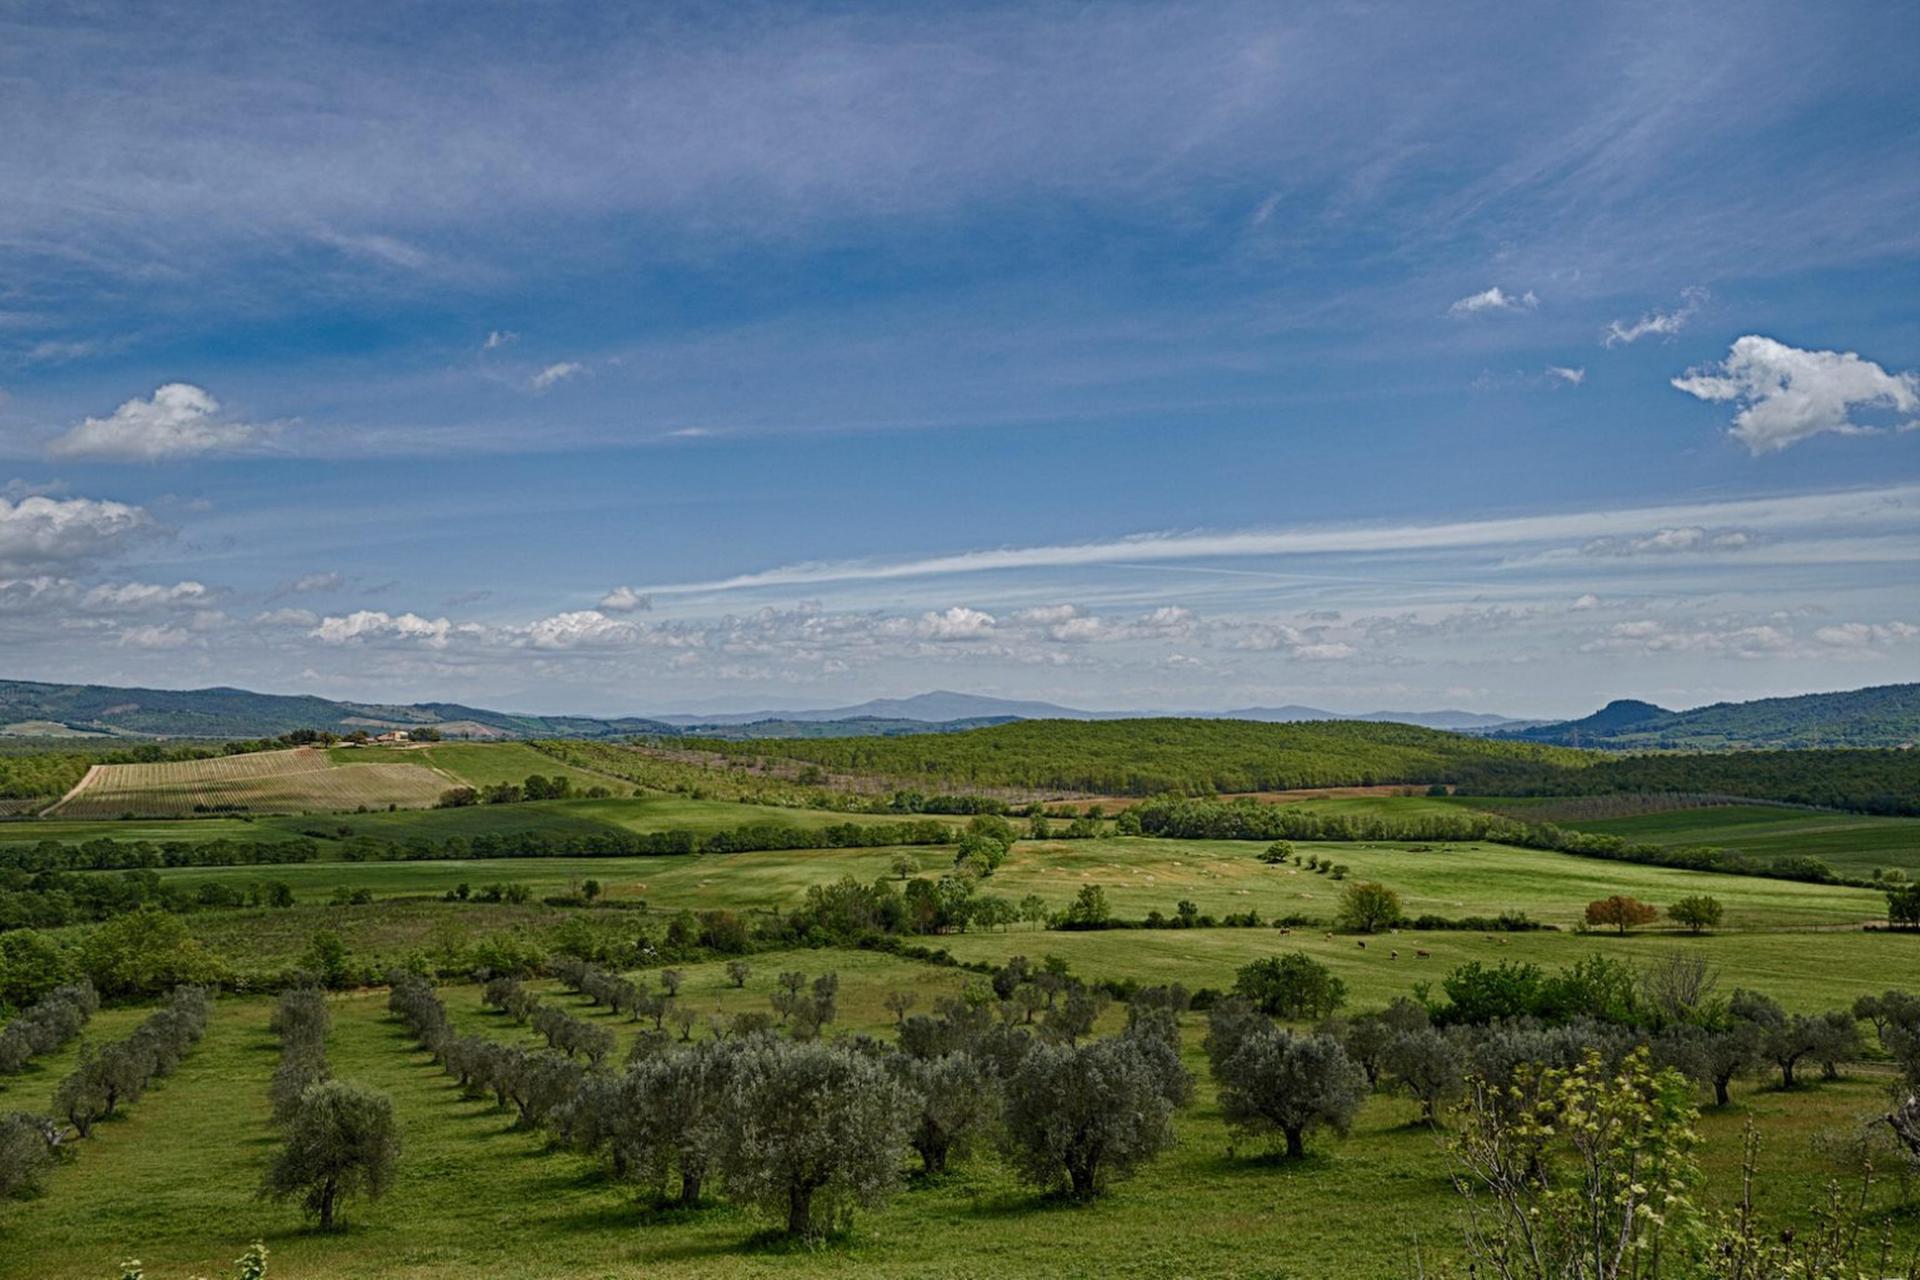 Agriturismo Toskana Ehemaliges Kloster in der Südtoskana | myitalyselection.de